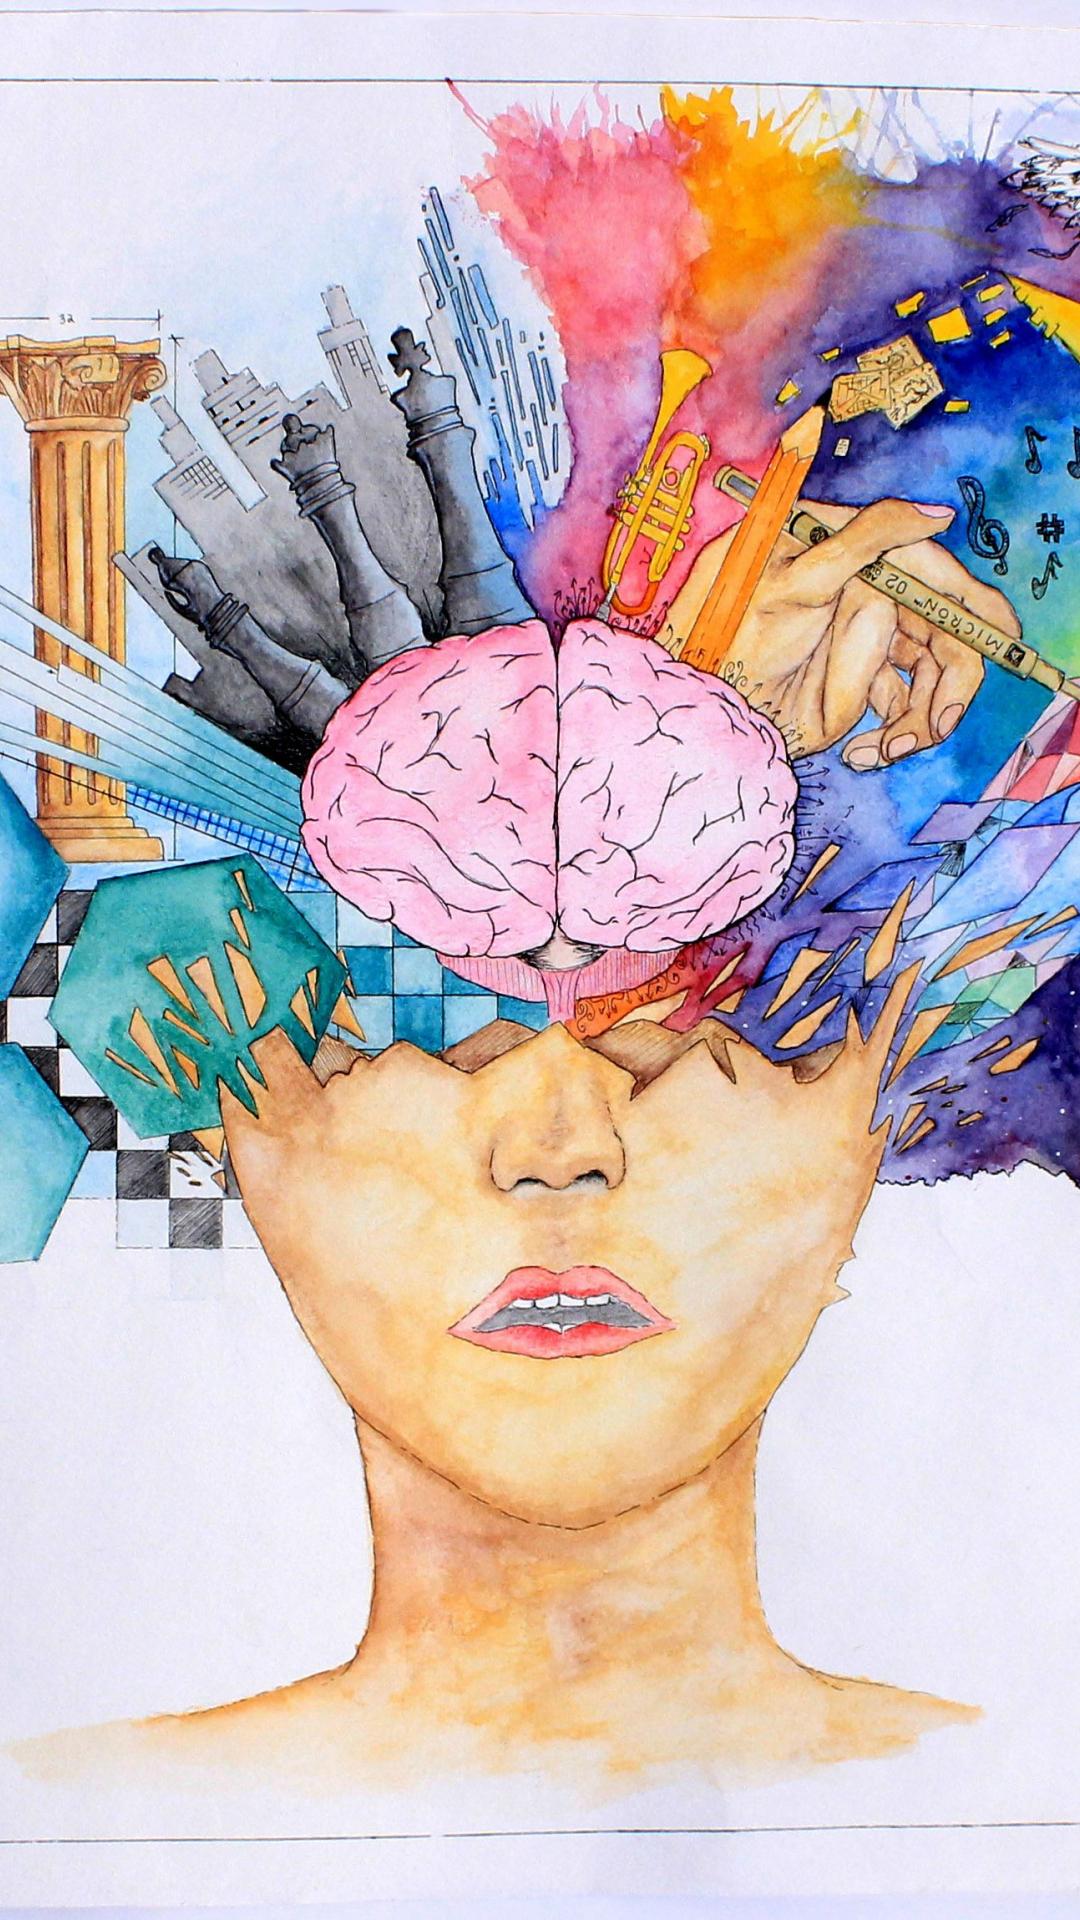 Free Download Left Brain Right Brain Wallpaper 3134x2299